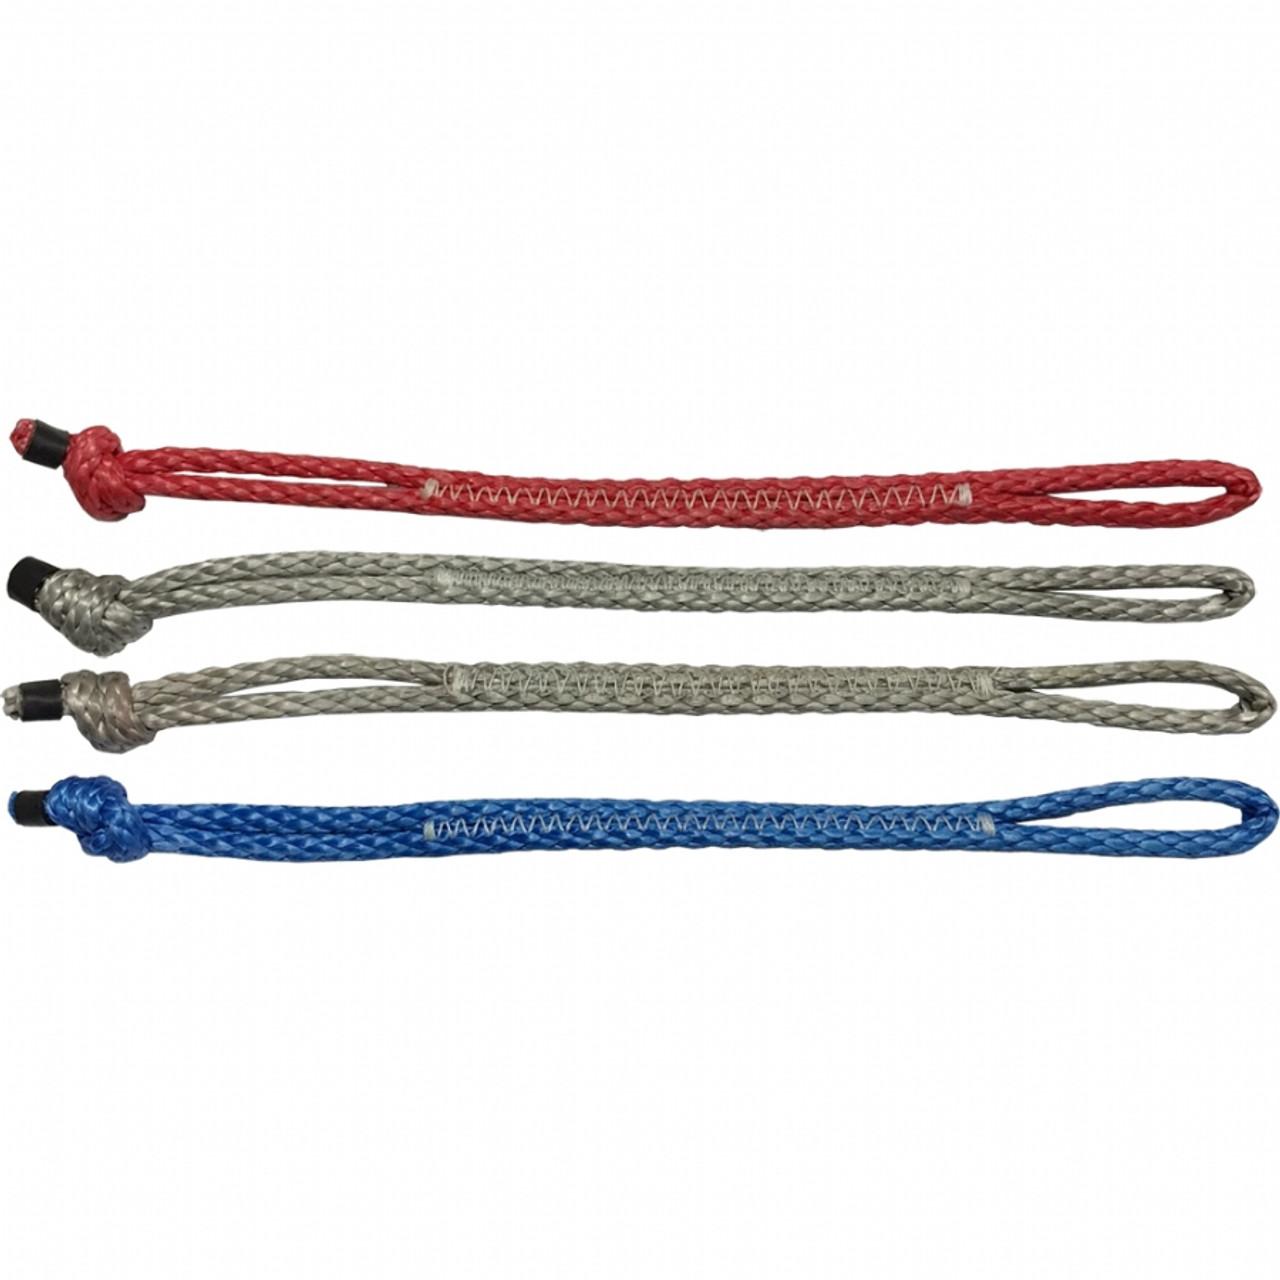 kitesurf pigtails 2 knots 2 loops set of 4